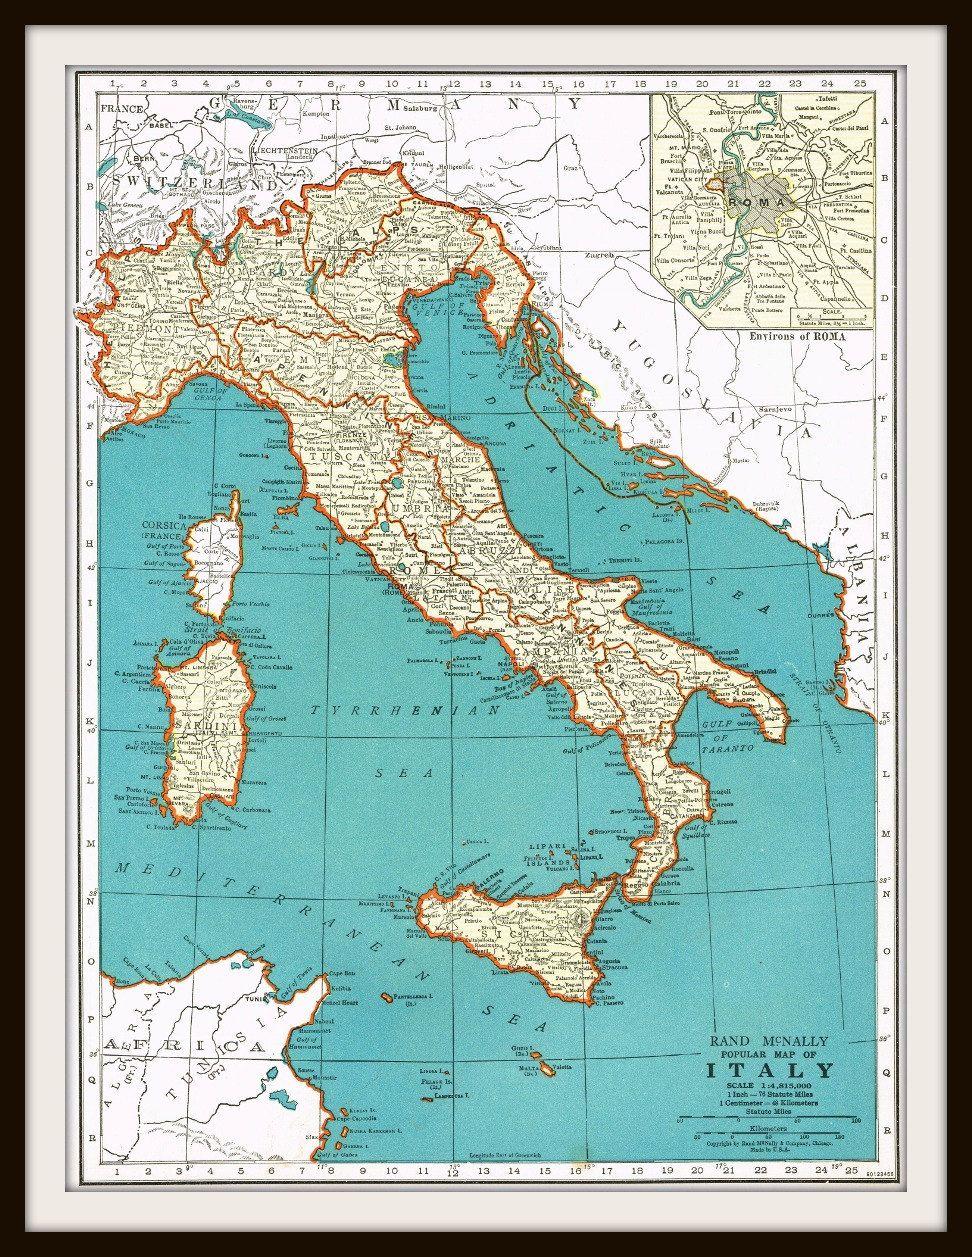 Antique map italy switzerland 1939 buy 3 maps by knickoftime antique map italy switzerland 1939 buy 3 maps by knickoftime gumiabroncs Choice Image